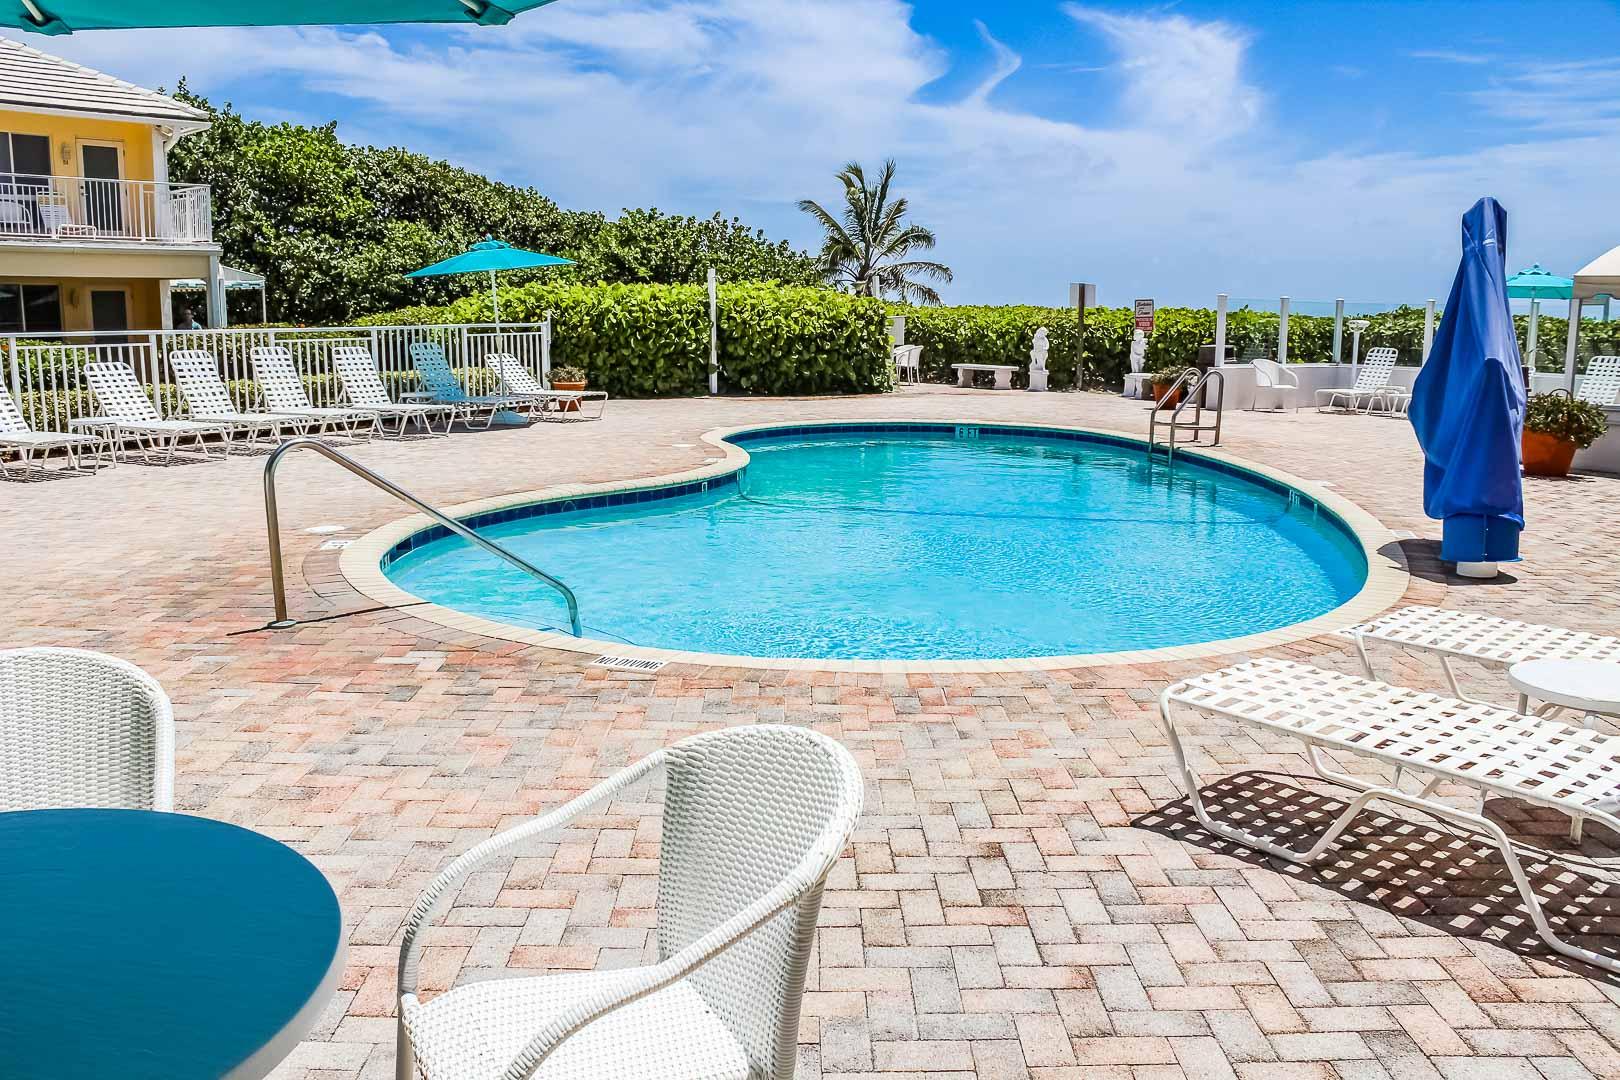 A crisp swimming pool at VRI's Berkshire on the Ocean in Florida.